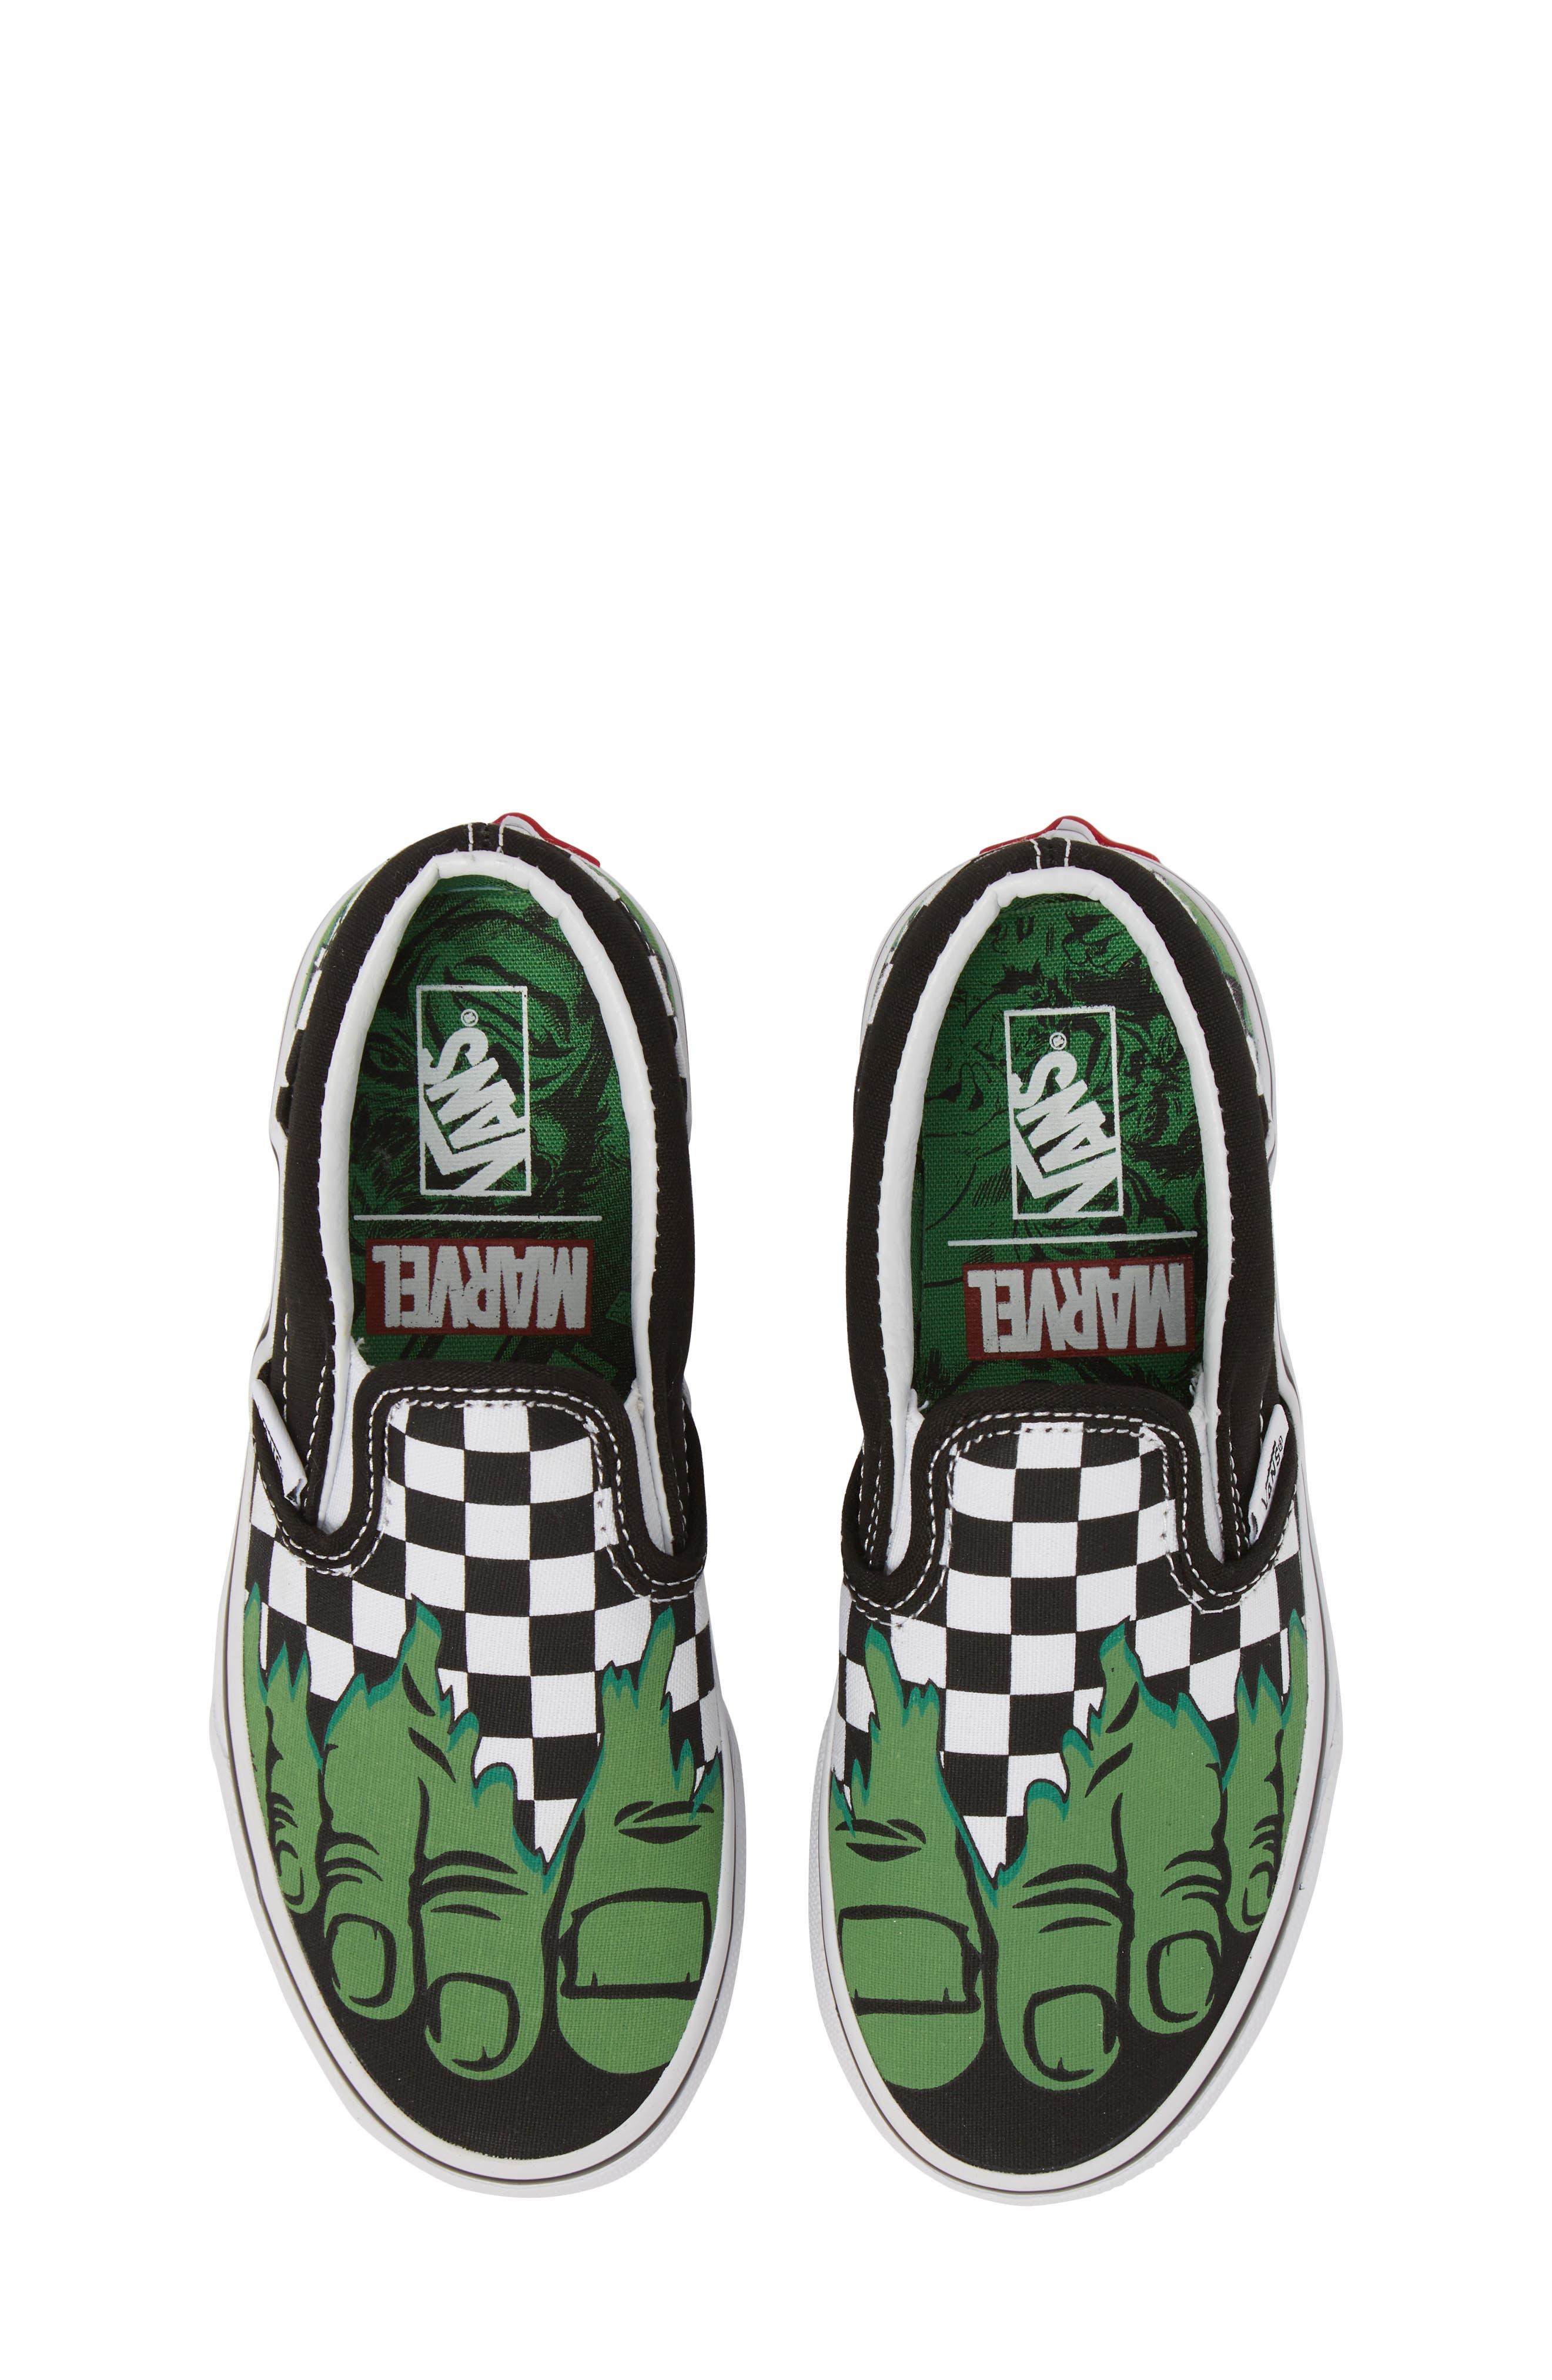 x Marvel<sup>®</sup> Hulk Checkerboard Slip-On Sneaker,                             Main thumbnail 1, color,                             310